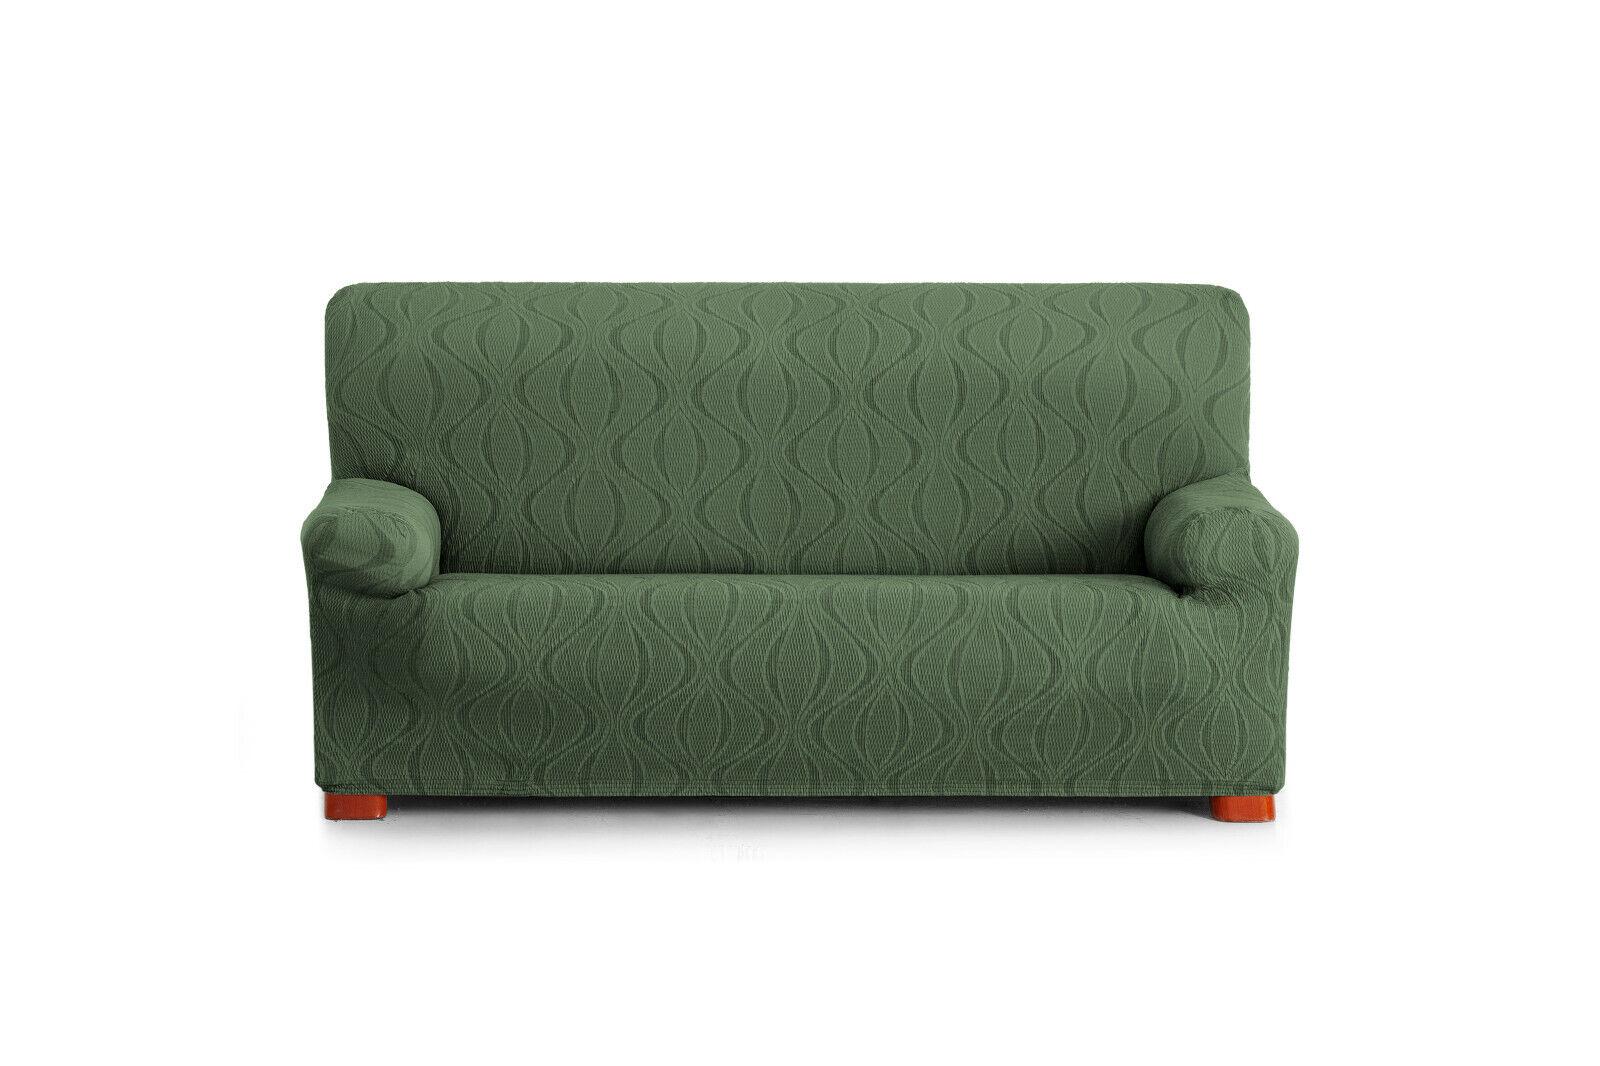 Funda elastica Grün para sofa 1,2,3,4 plazas, silla, silla, silla, orejero relax pies juntos f36138